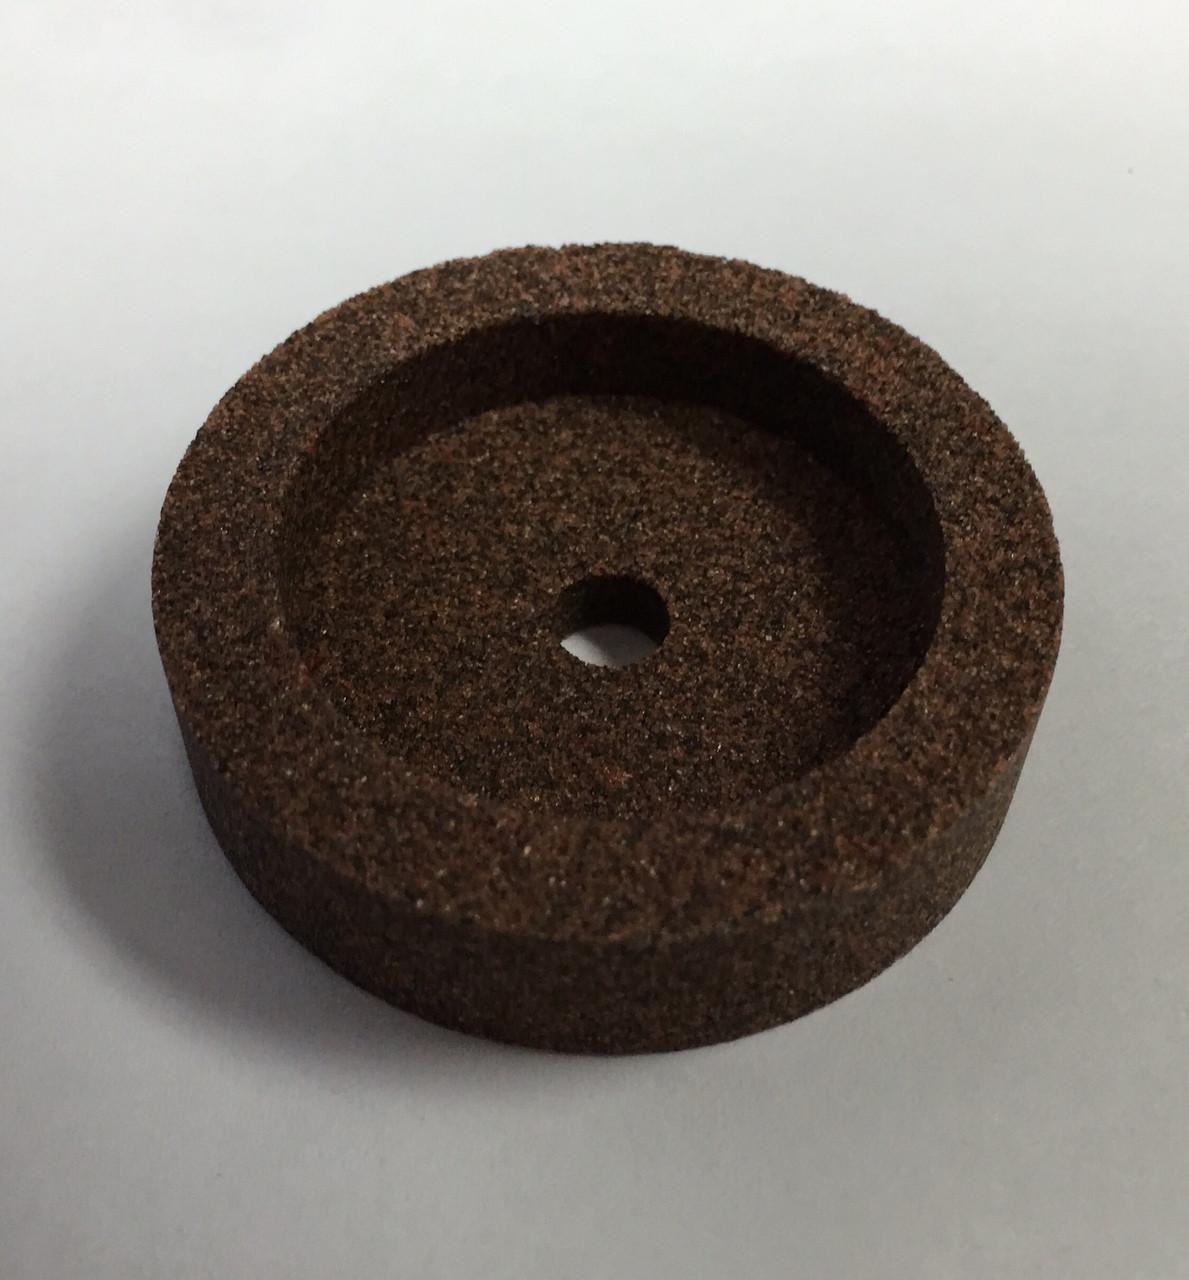 Globe G10,G12,G12A,G14 - Sharpening Stone - MCC17